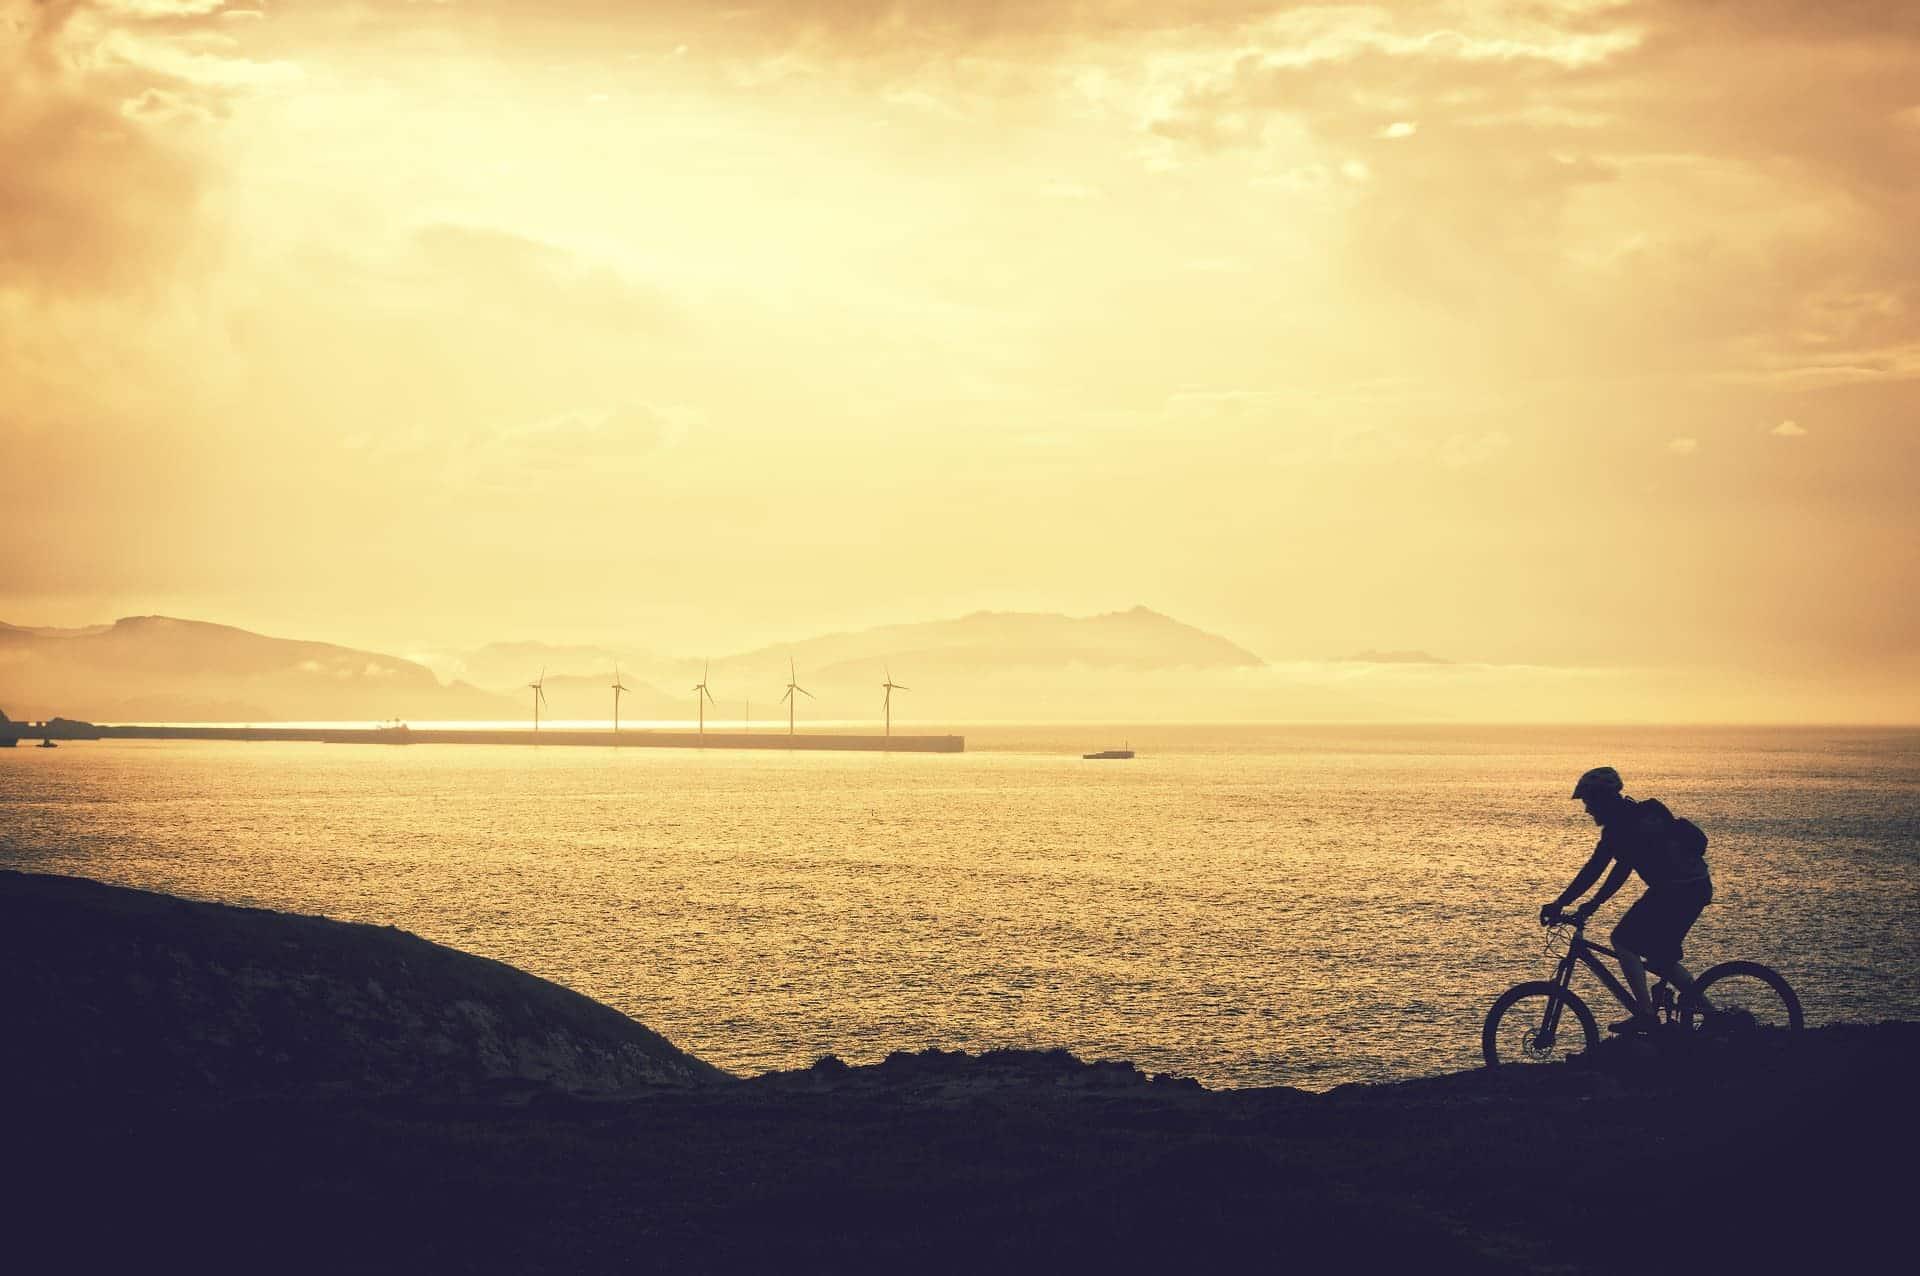 Morning Bike Rides, Smiles & the Now